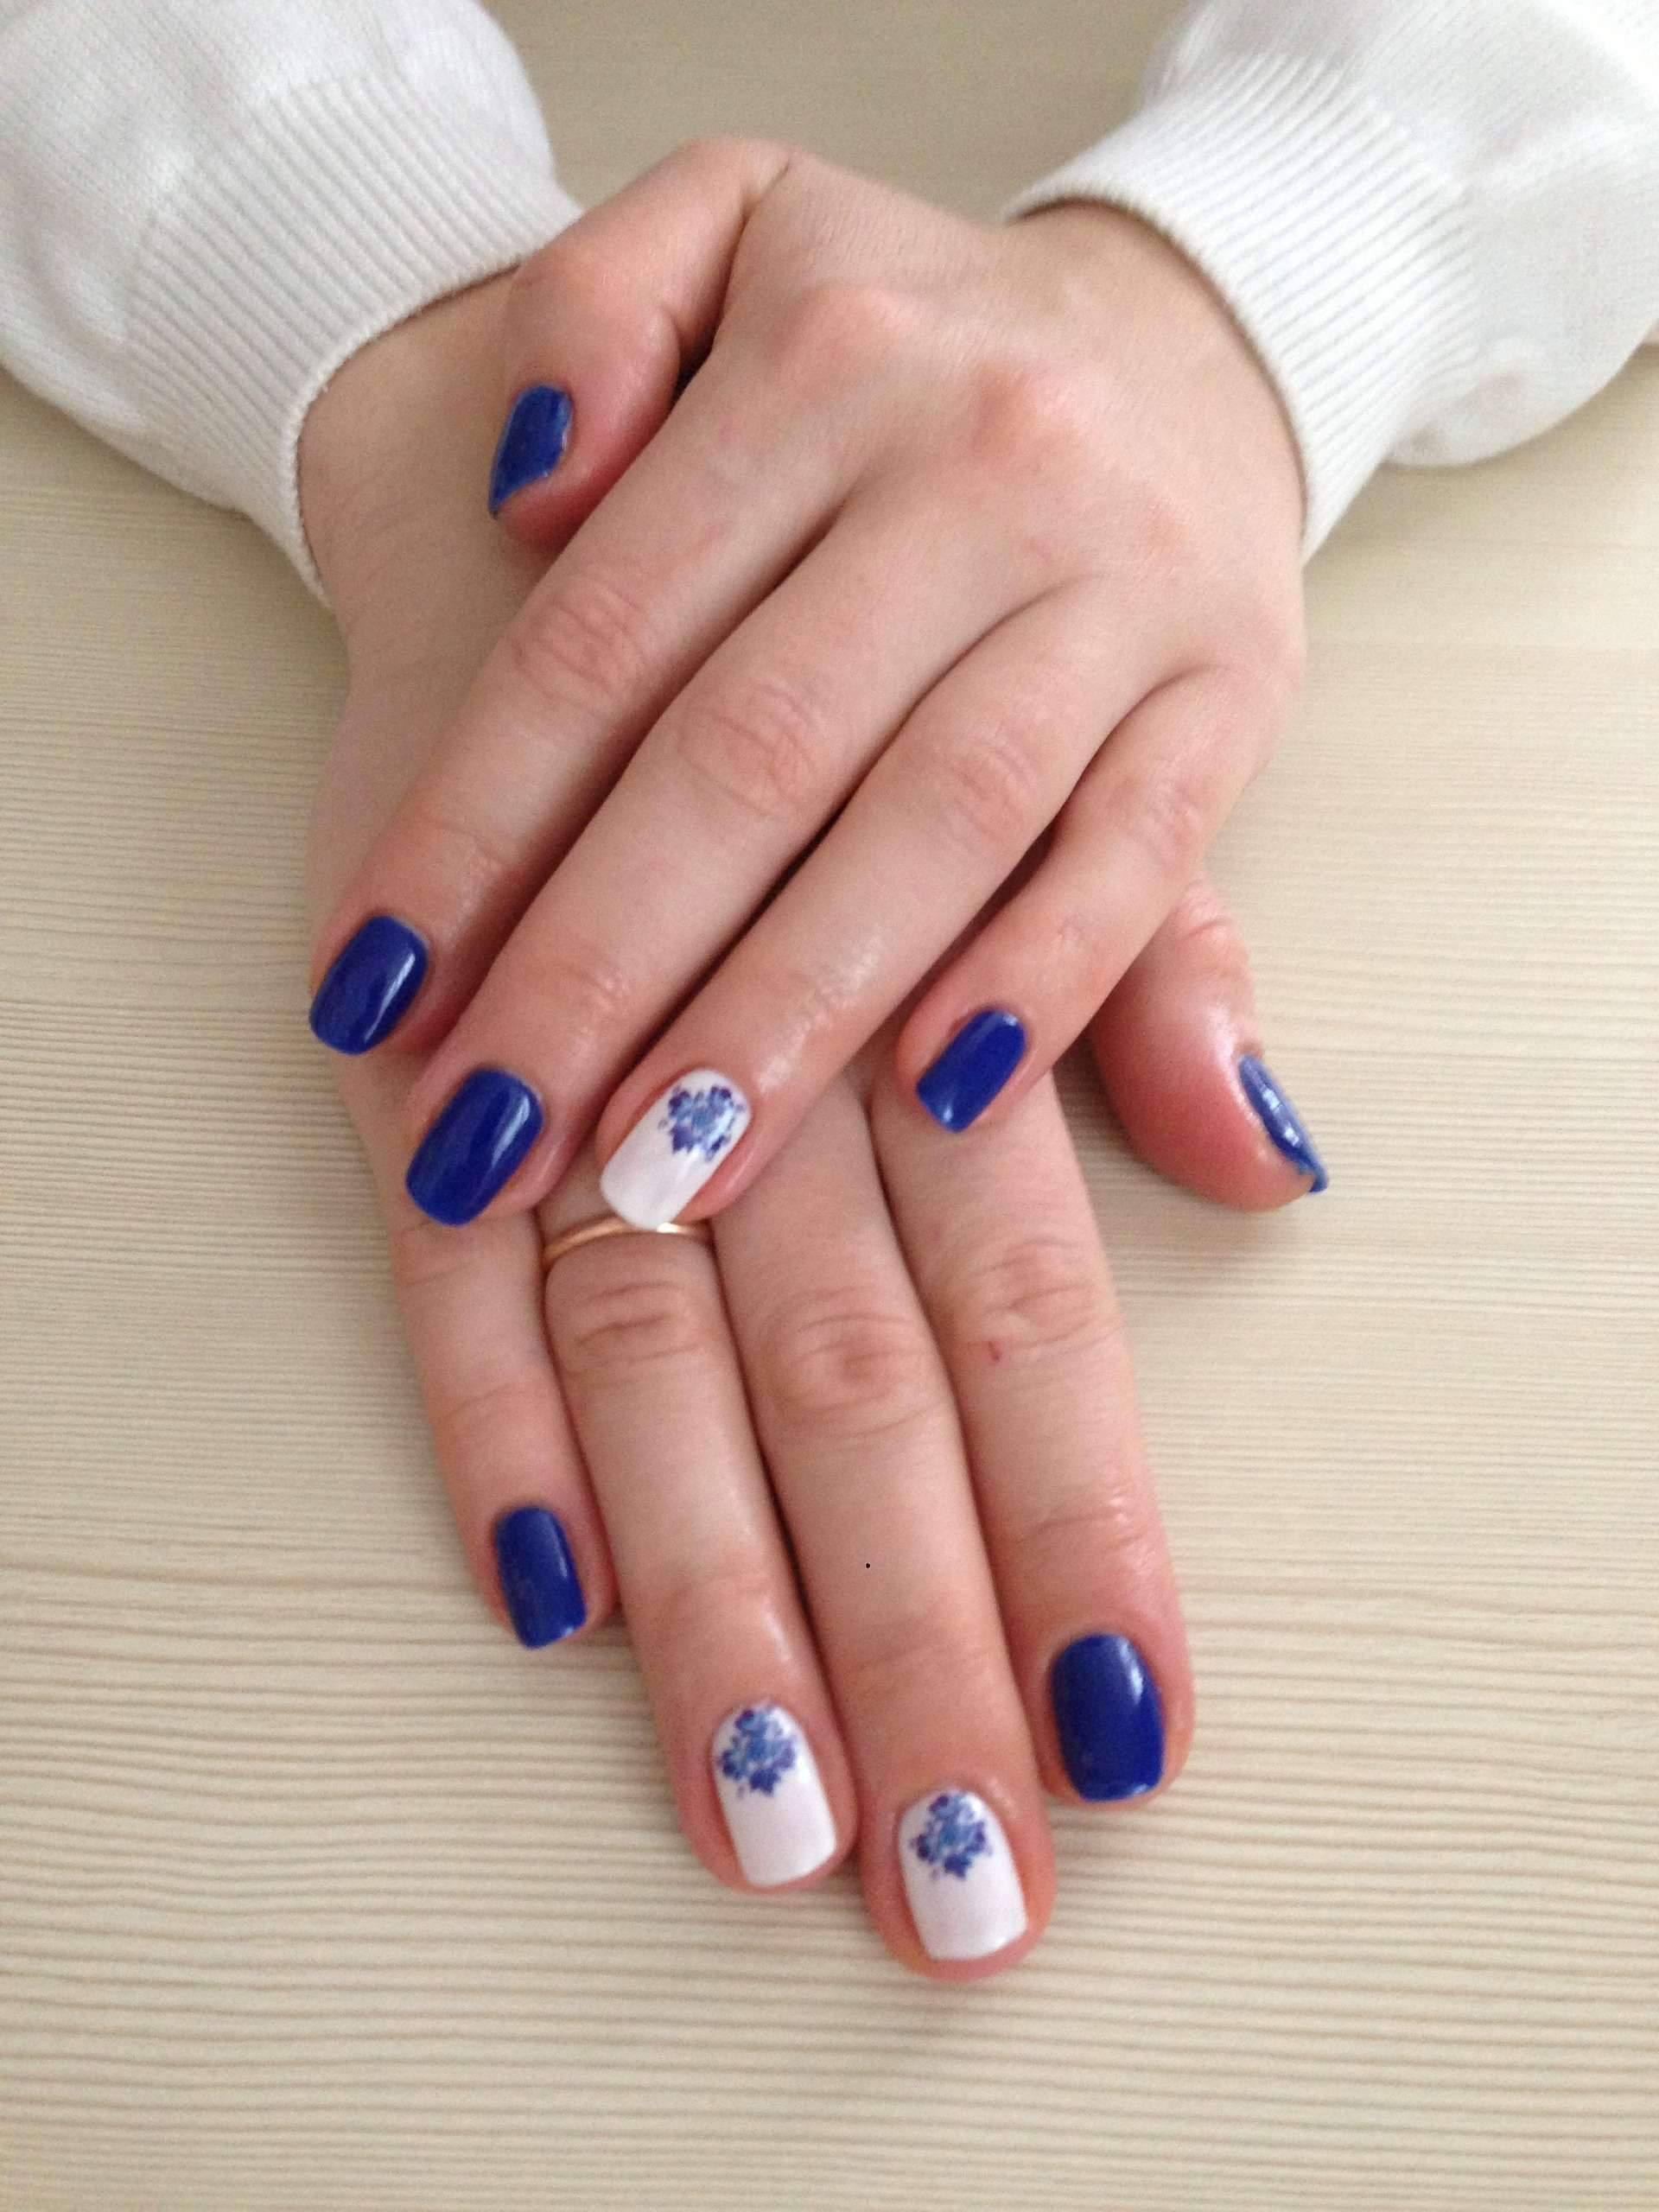 Маникюр синий с лунками фото